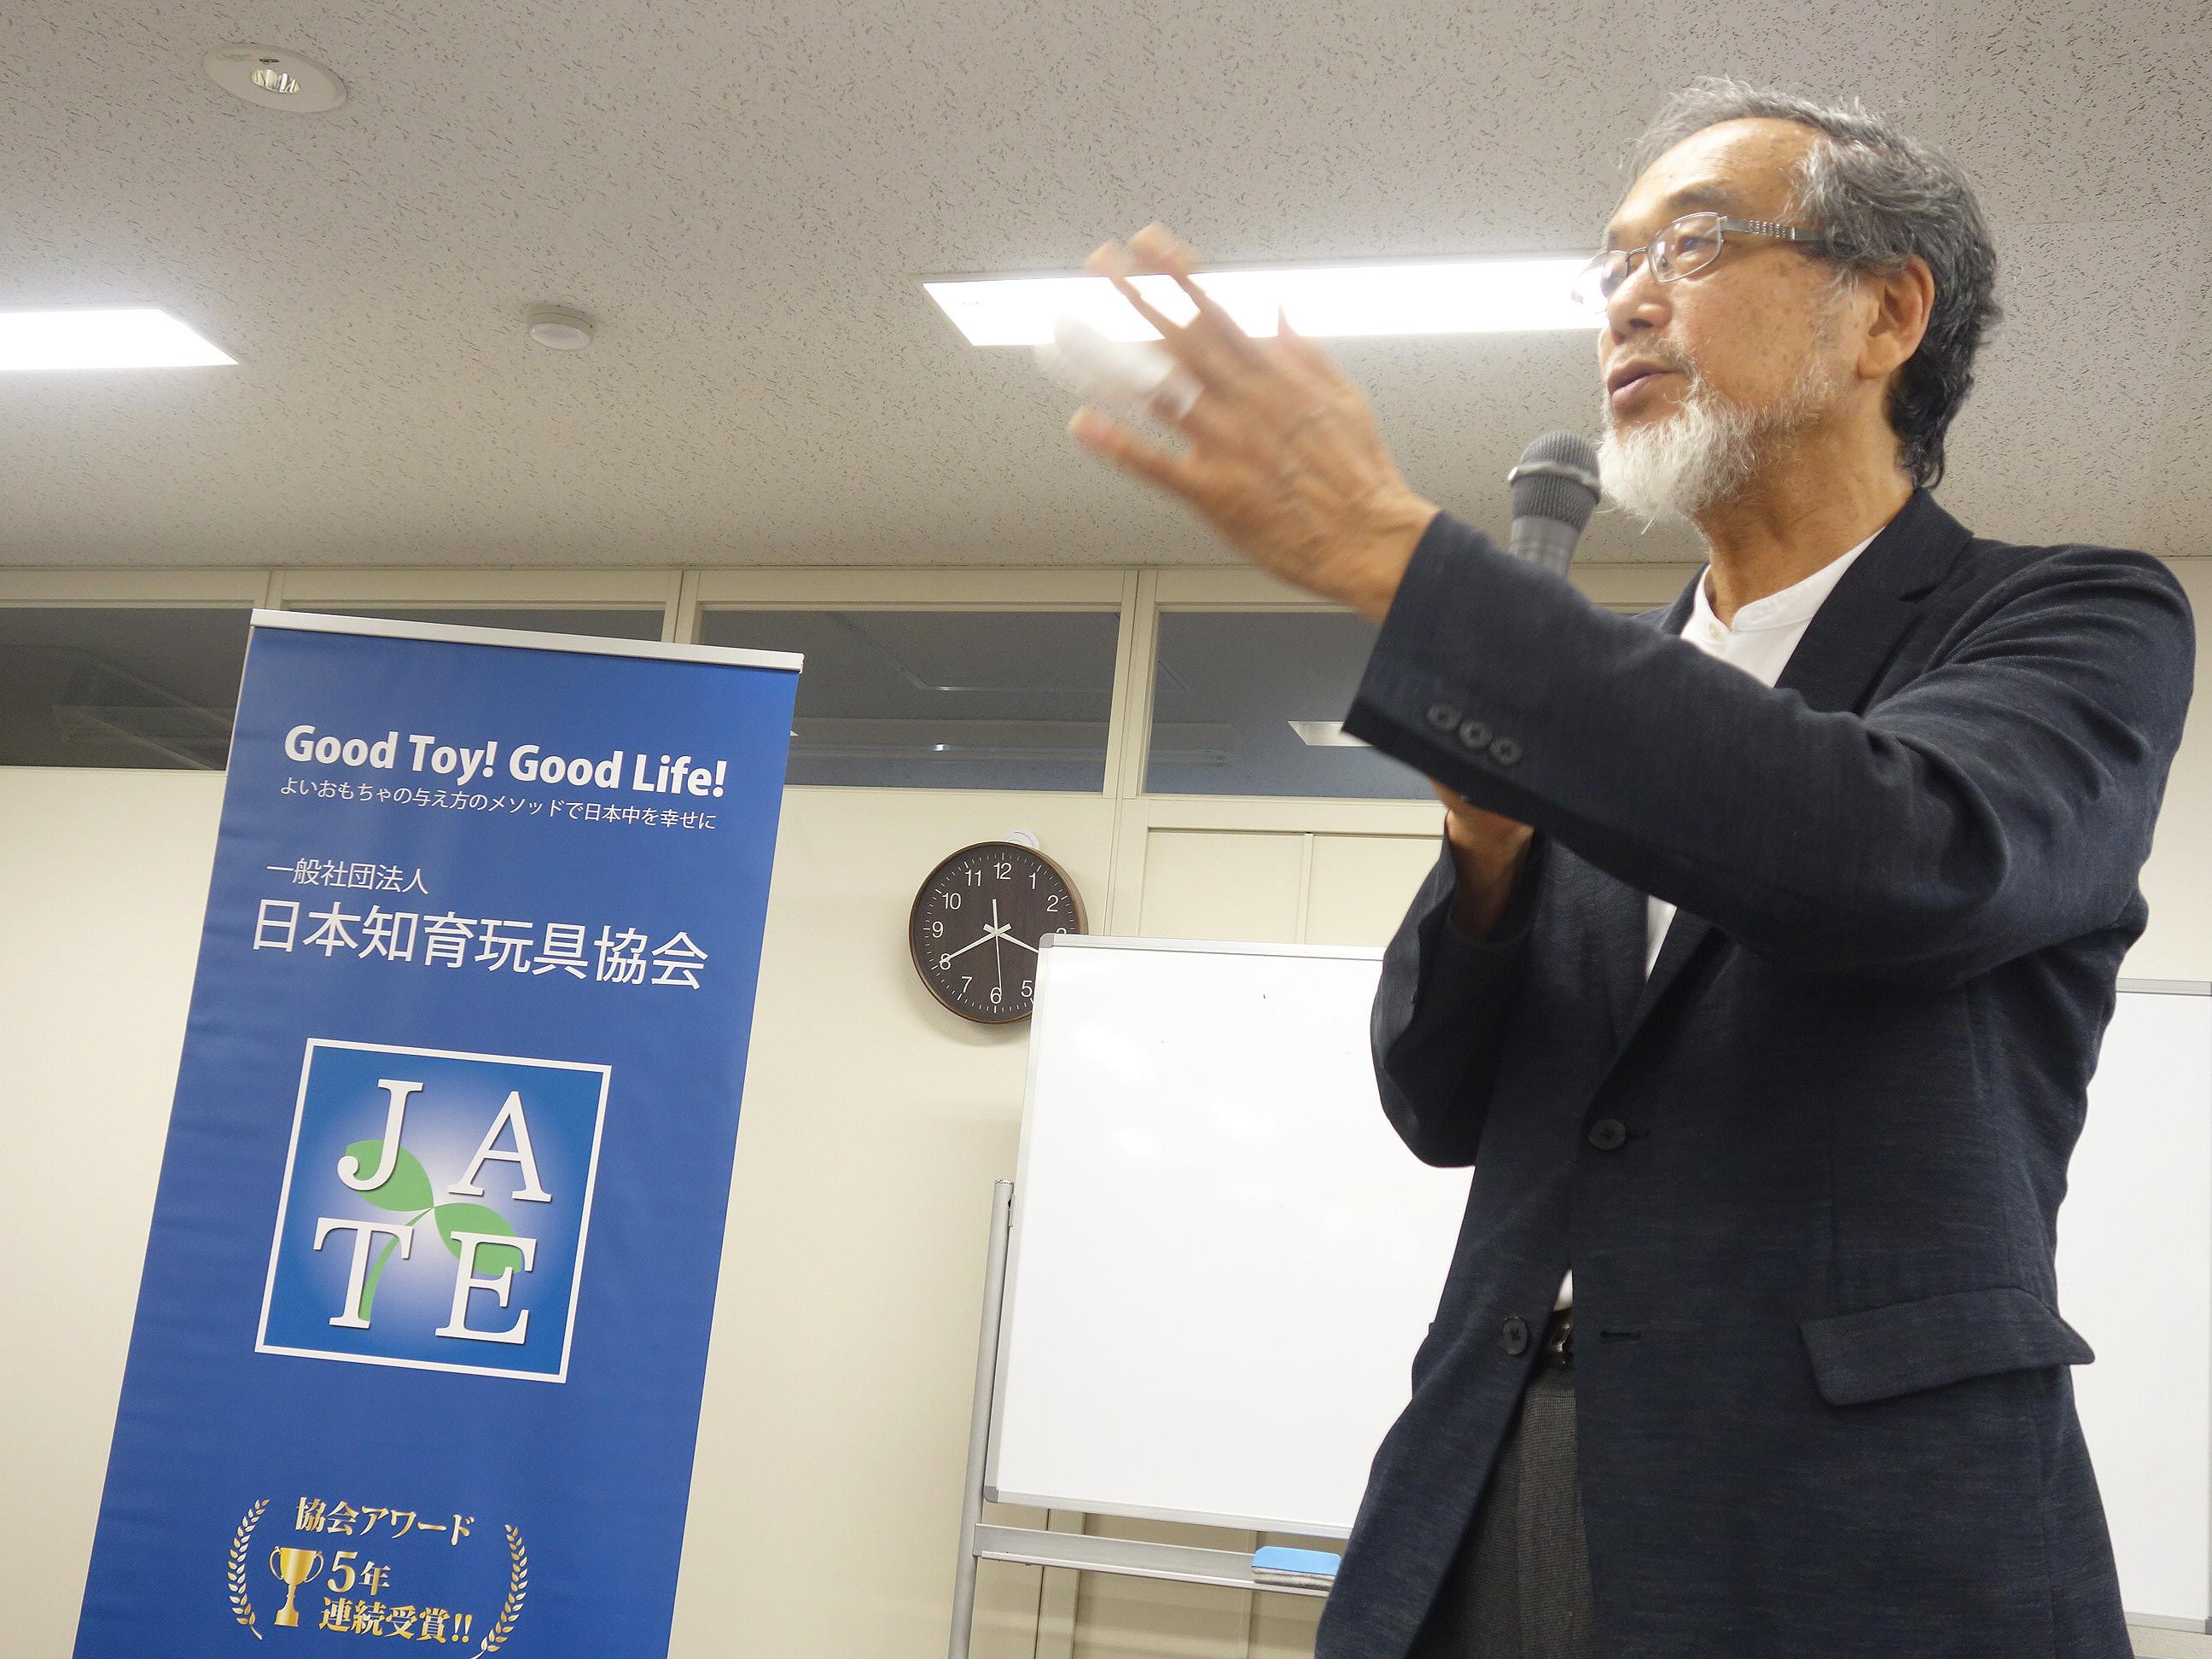 保育環境改善セミナー_汐見稔幸先生